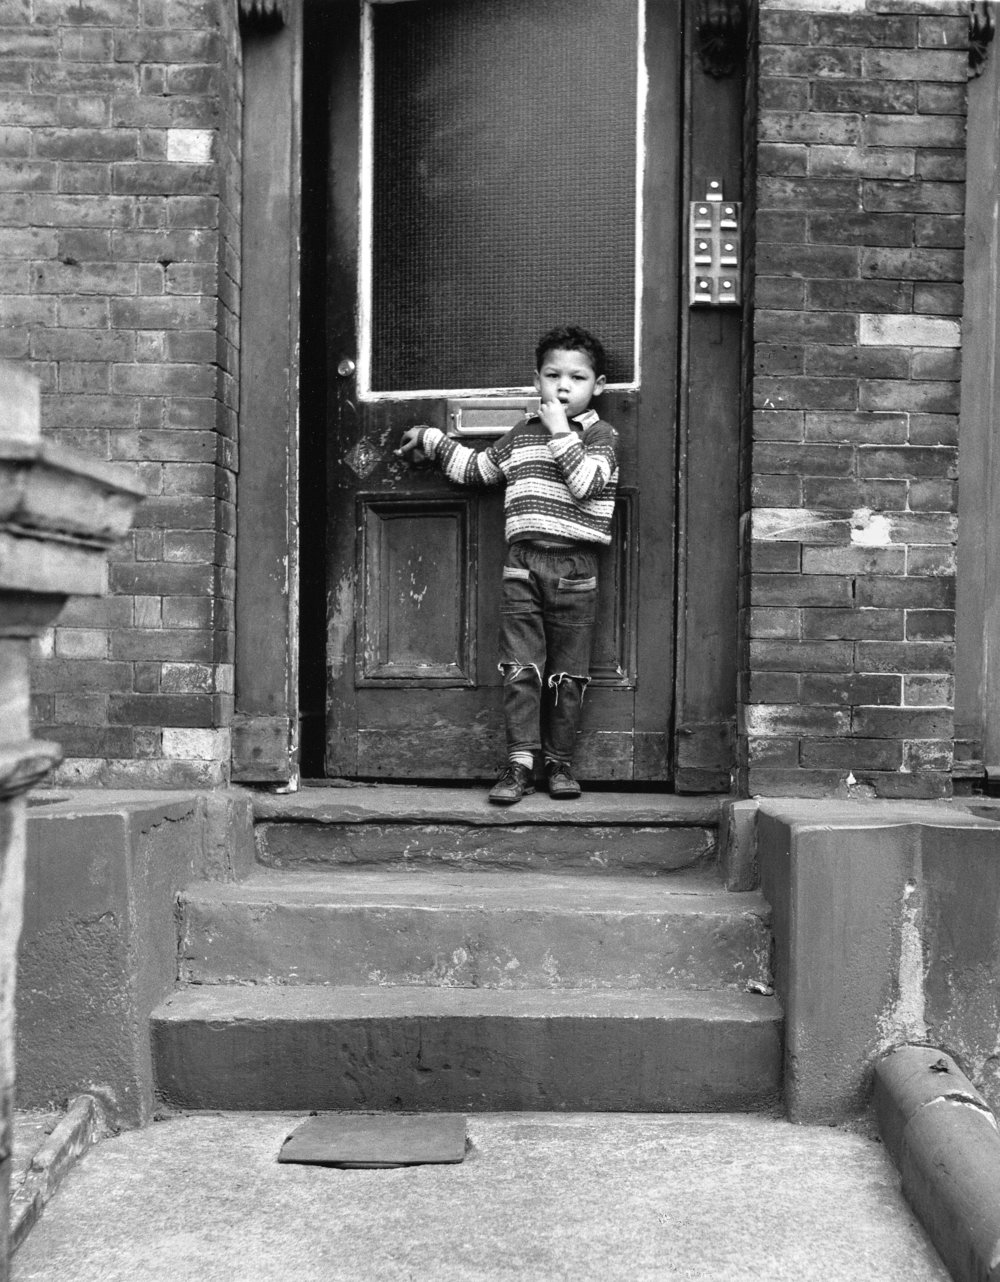 Cheetham, Mcr., Boy Outside House, 18-67-3 (1966).jpg